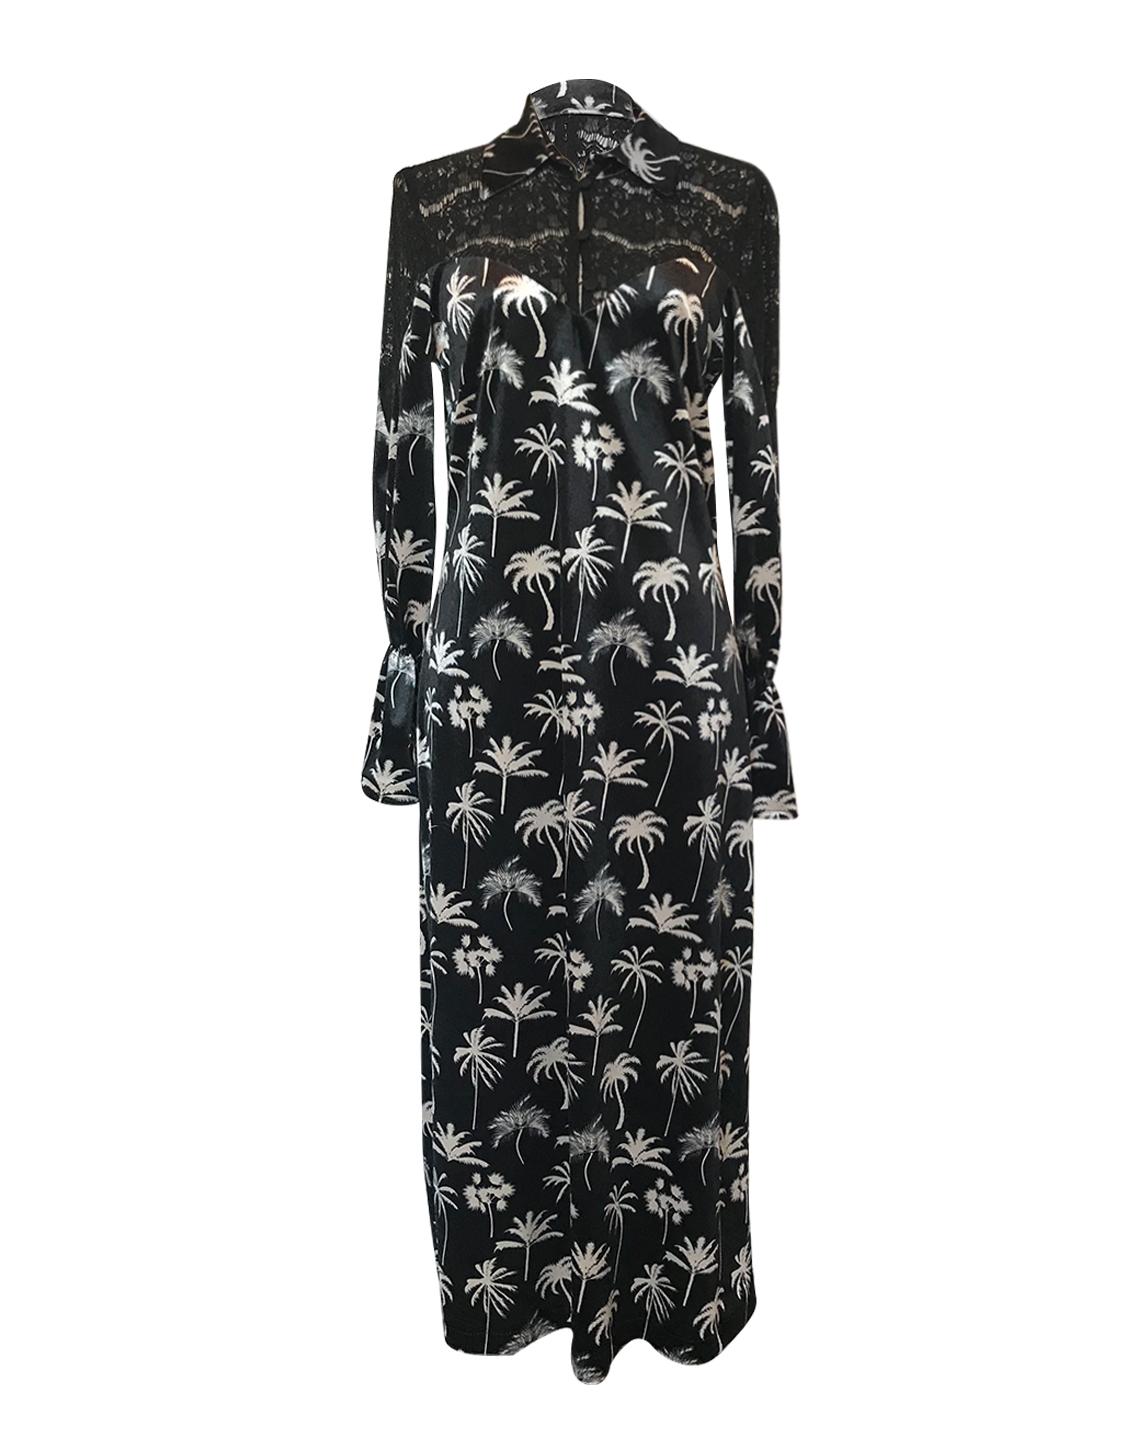 Baru Dress by Jessica K on curated-crowd.com